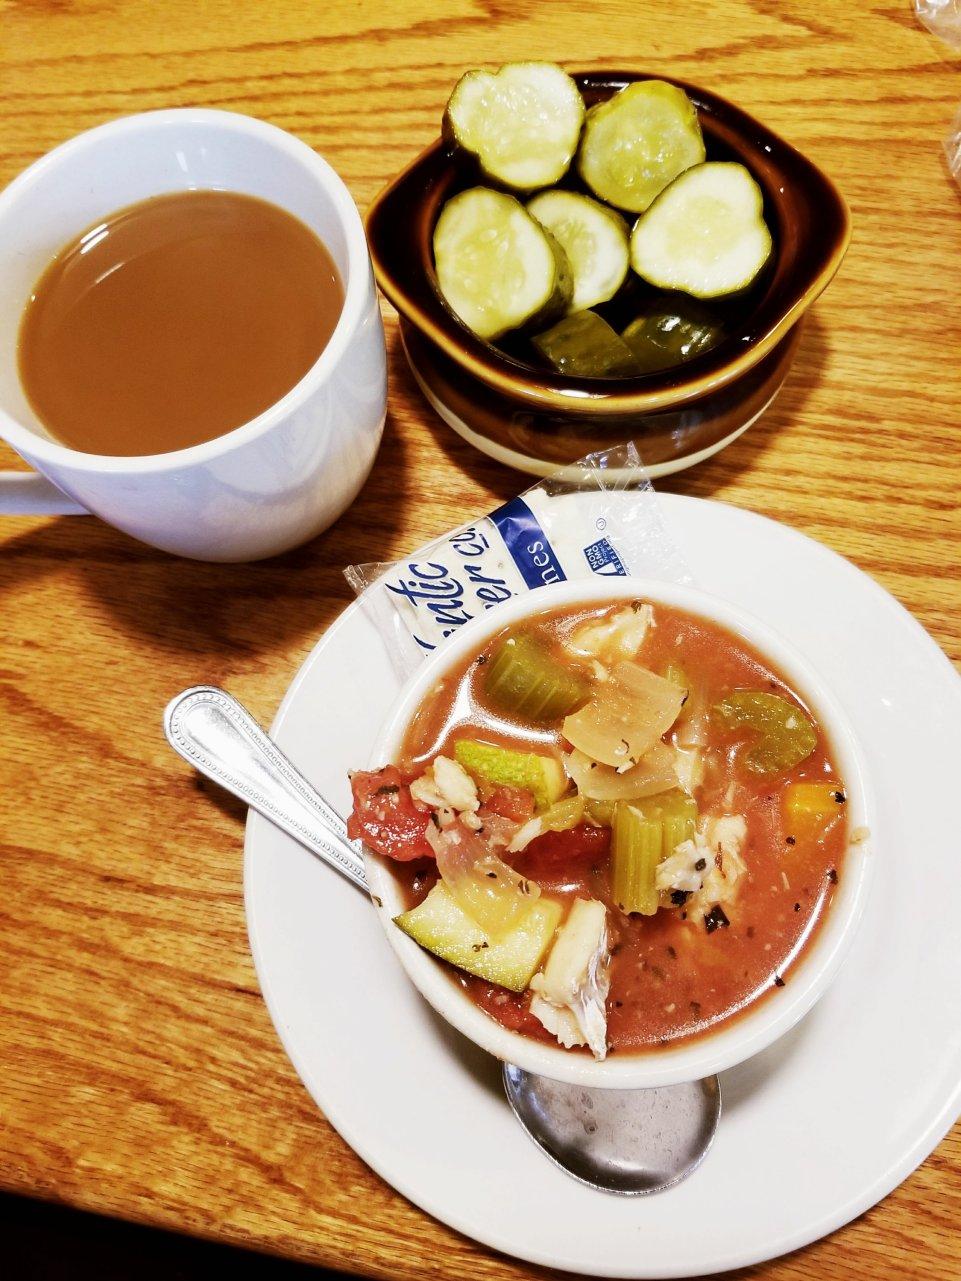 New York Deli in St Clair Shores, MI - Seafood Chowder